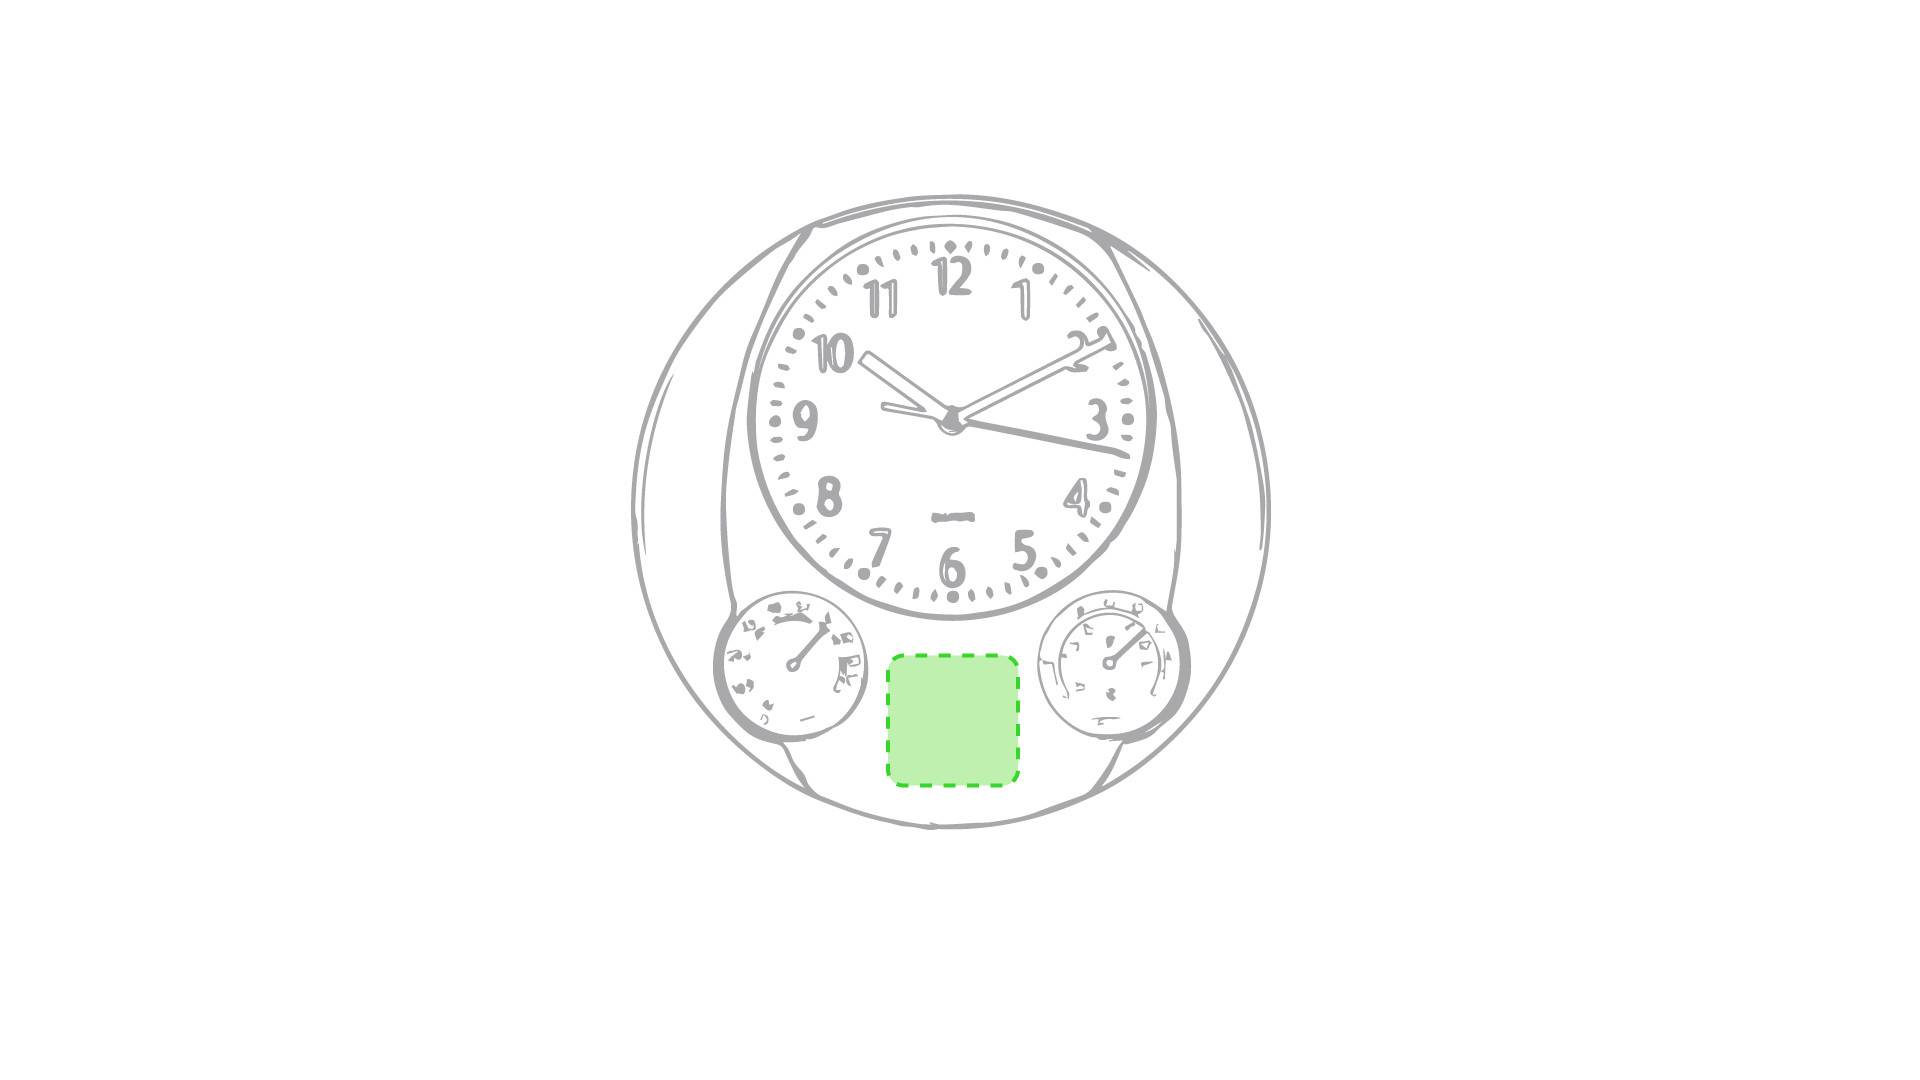 Reloj de pared con termómetro 1